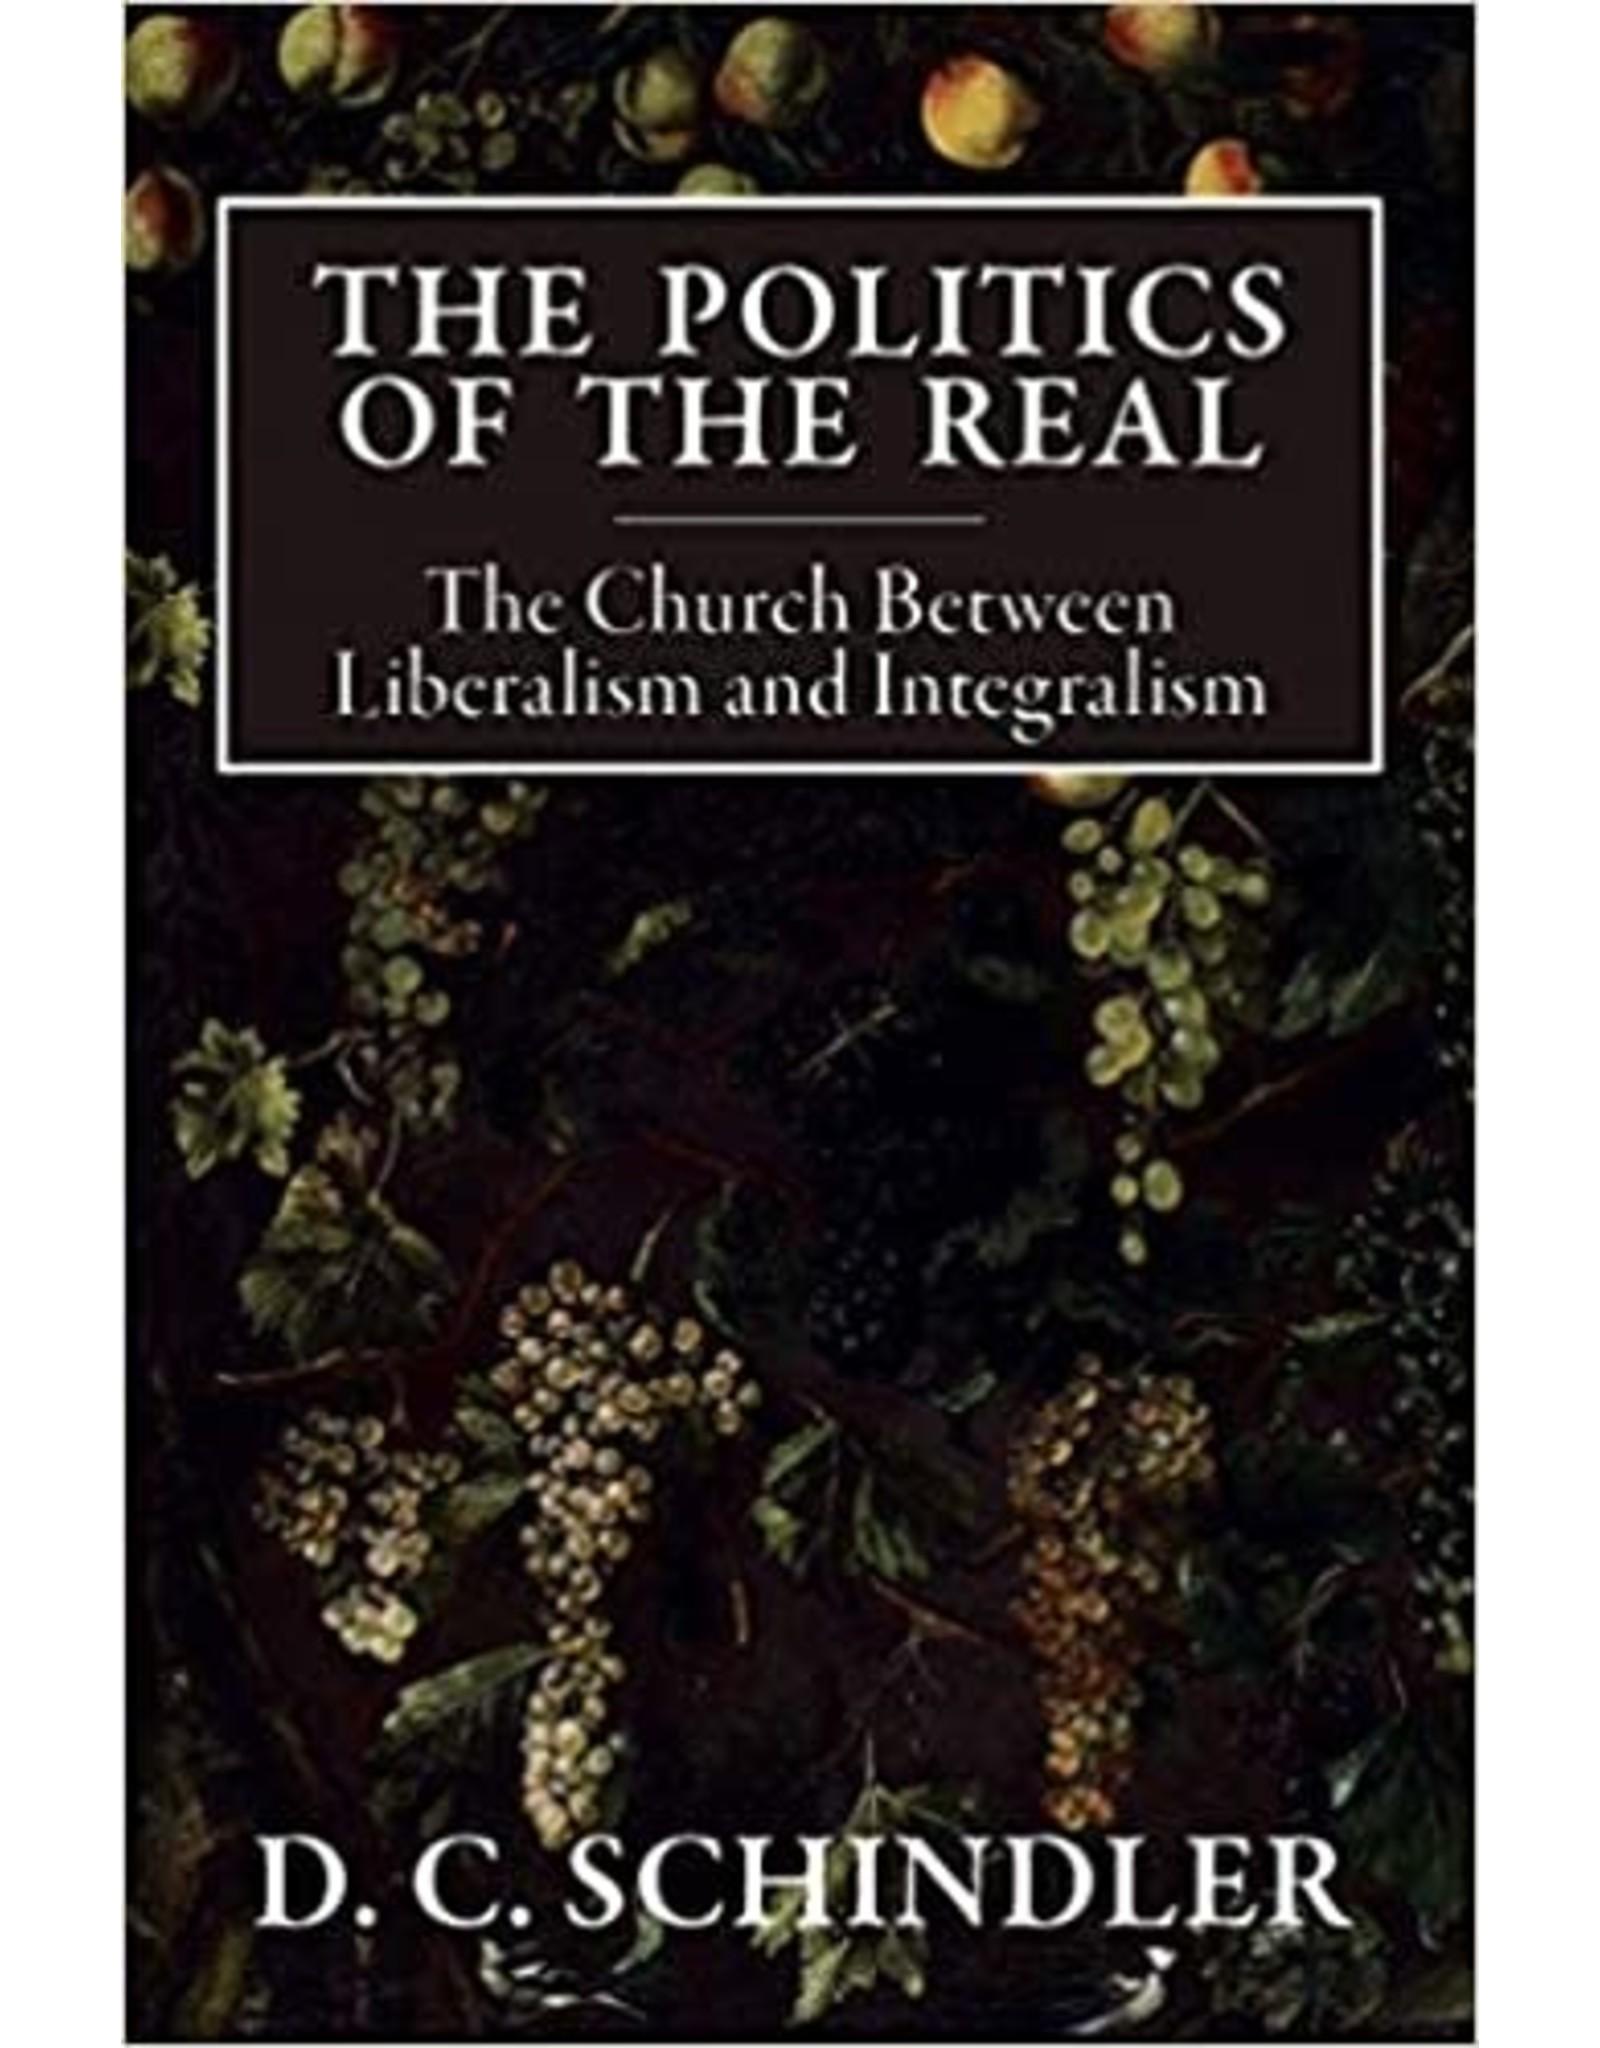 Politics of the Real: The Church Between Liberalism & Integralism